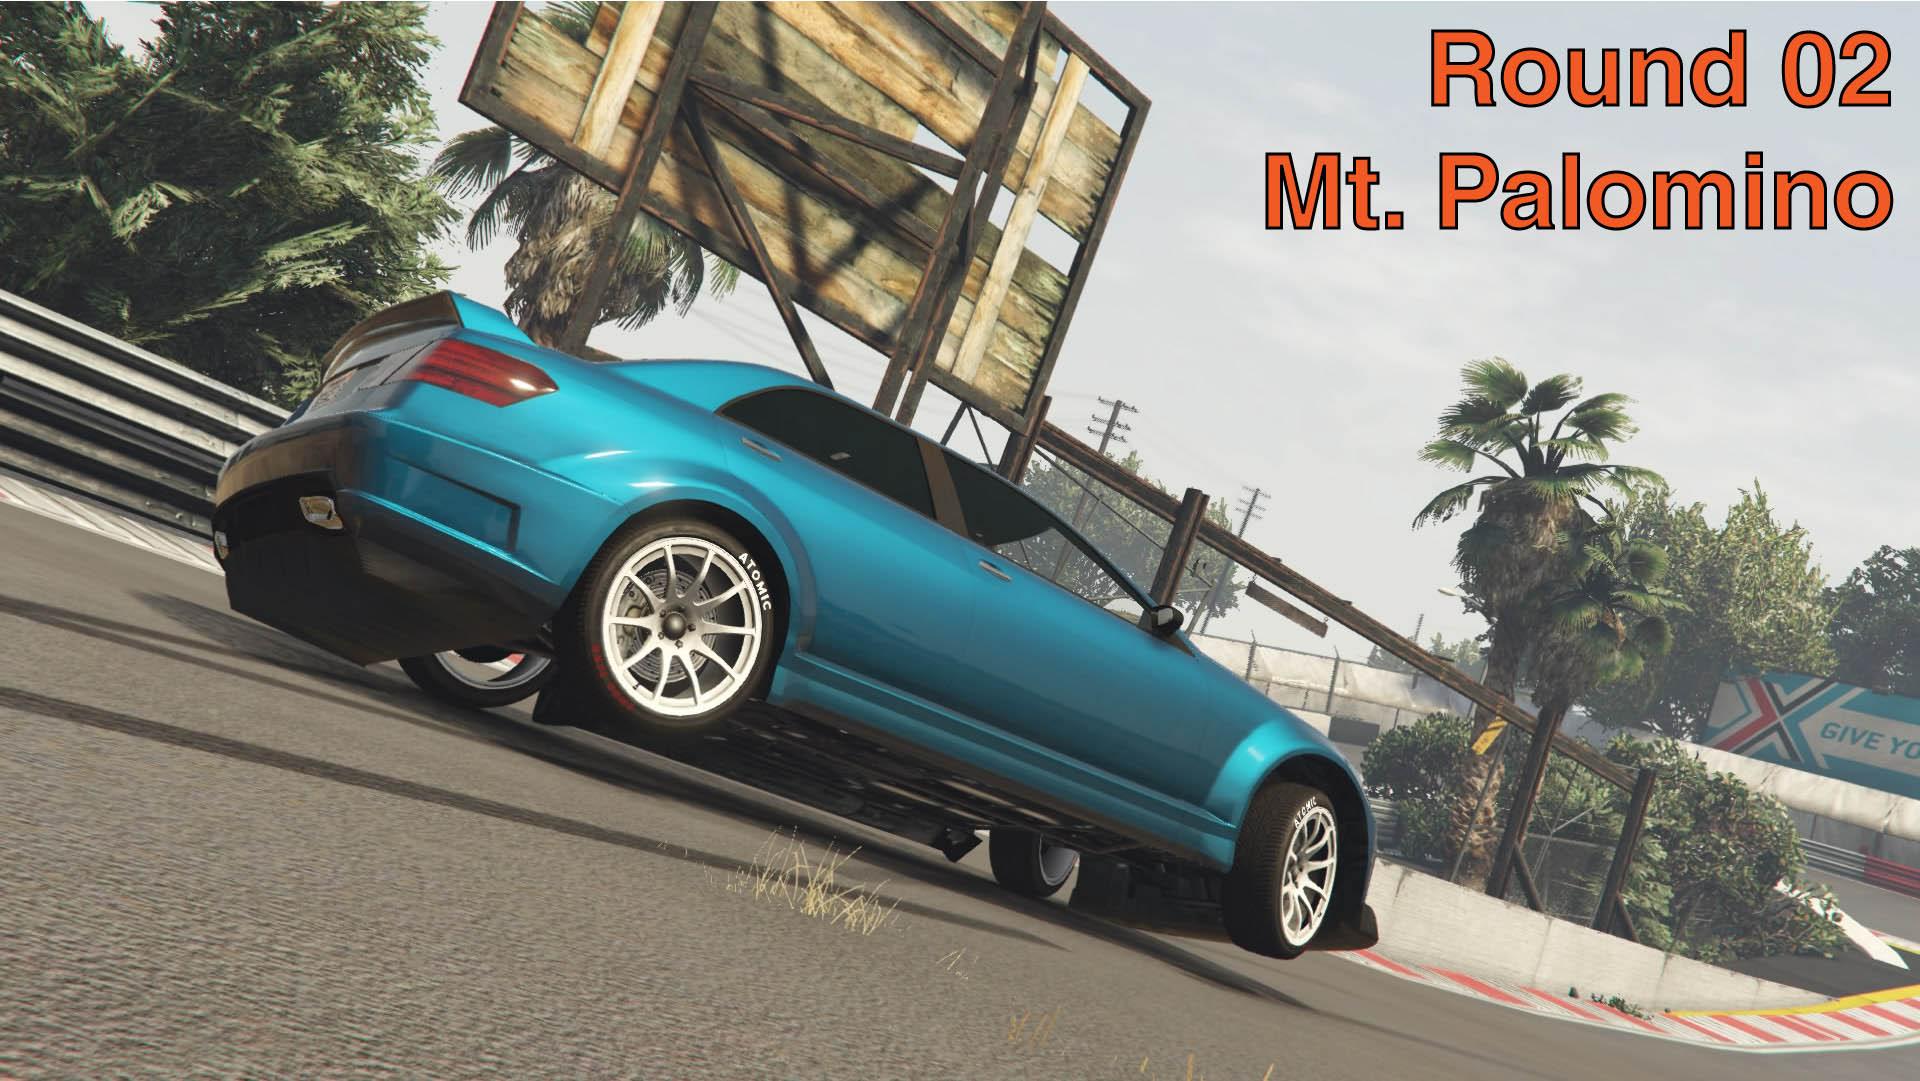 rd02.jpg